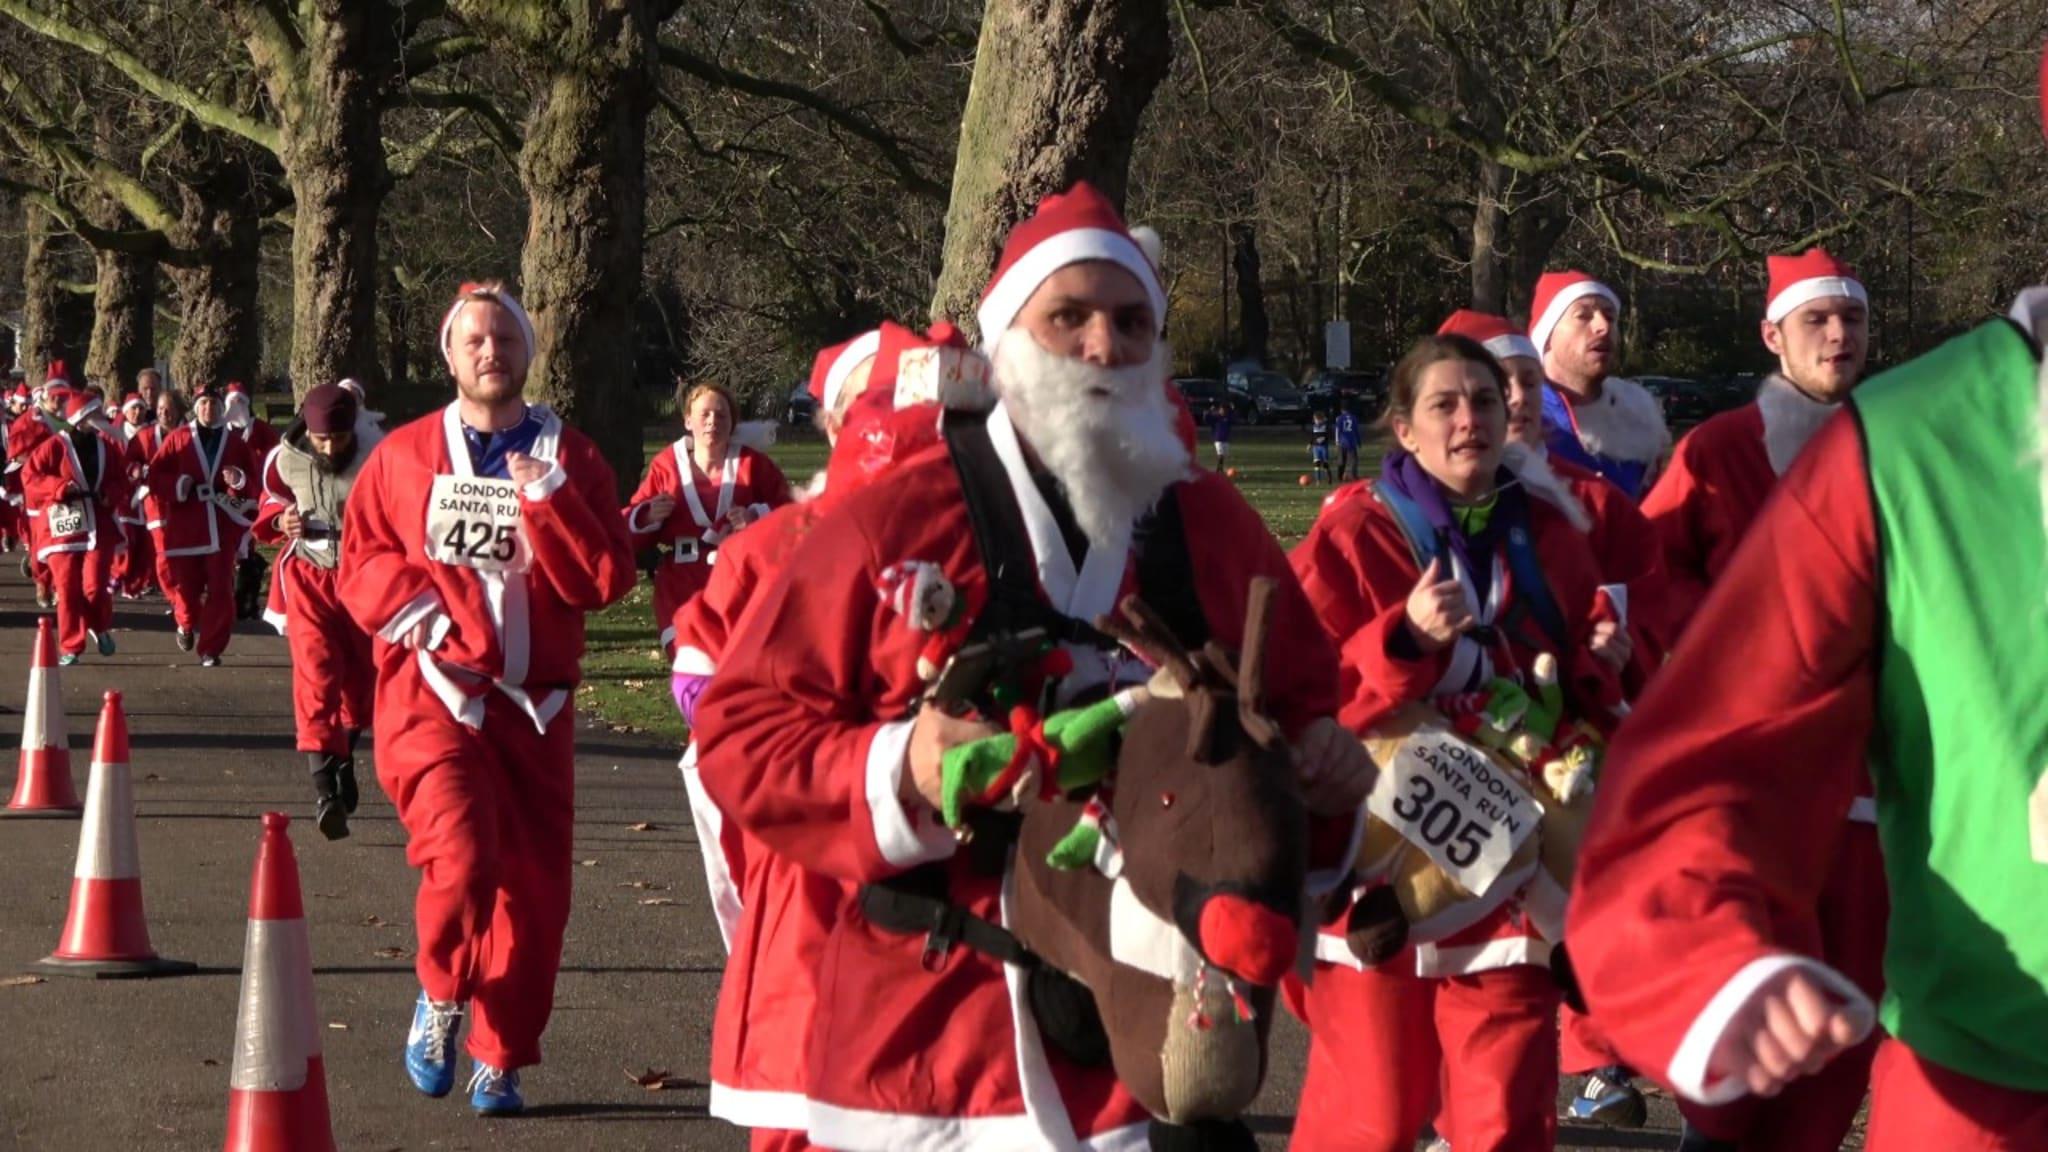 The Richmond Christmas 10k & 5k